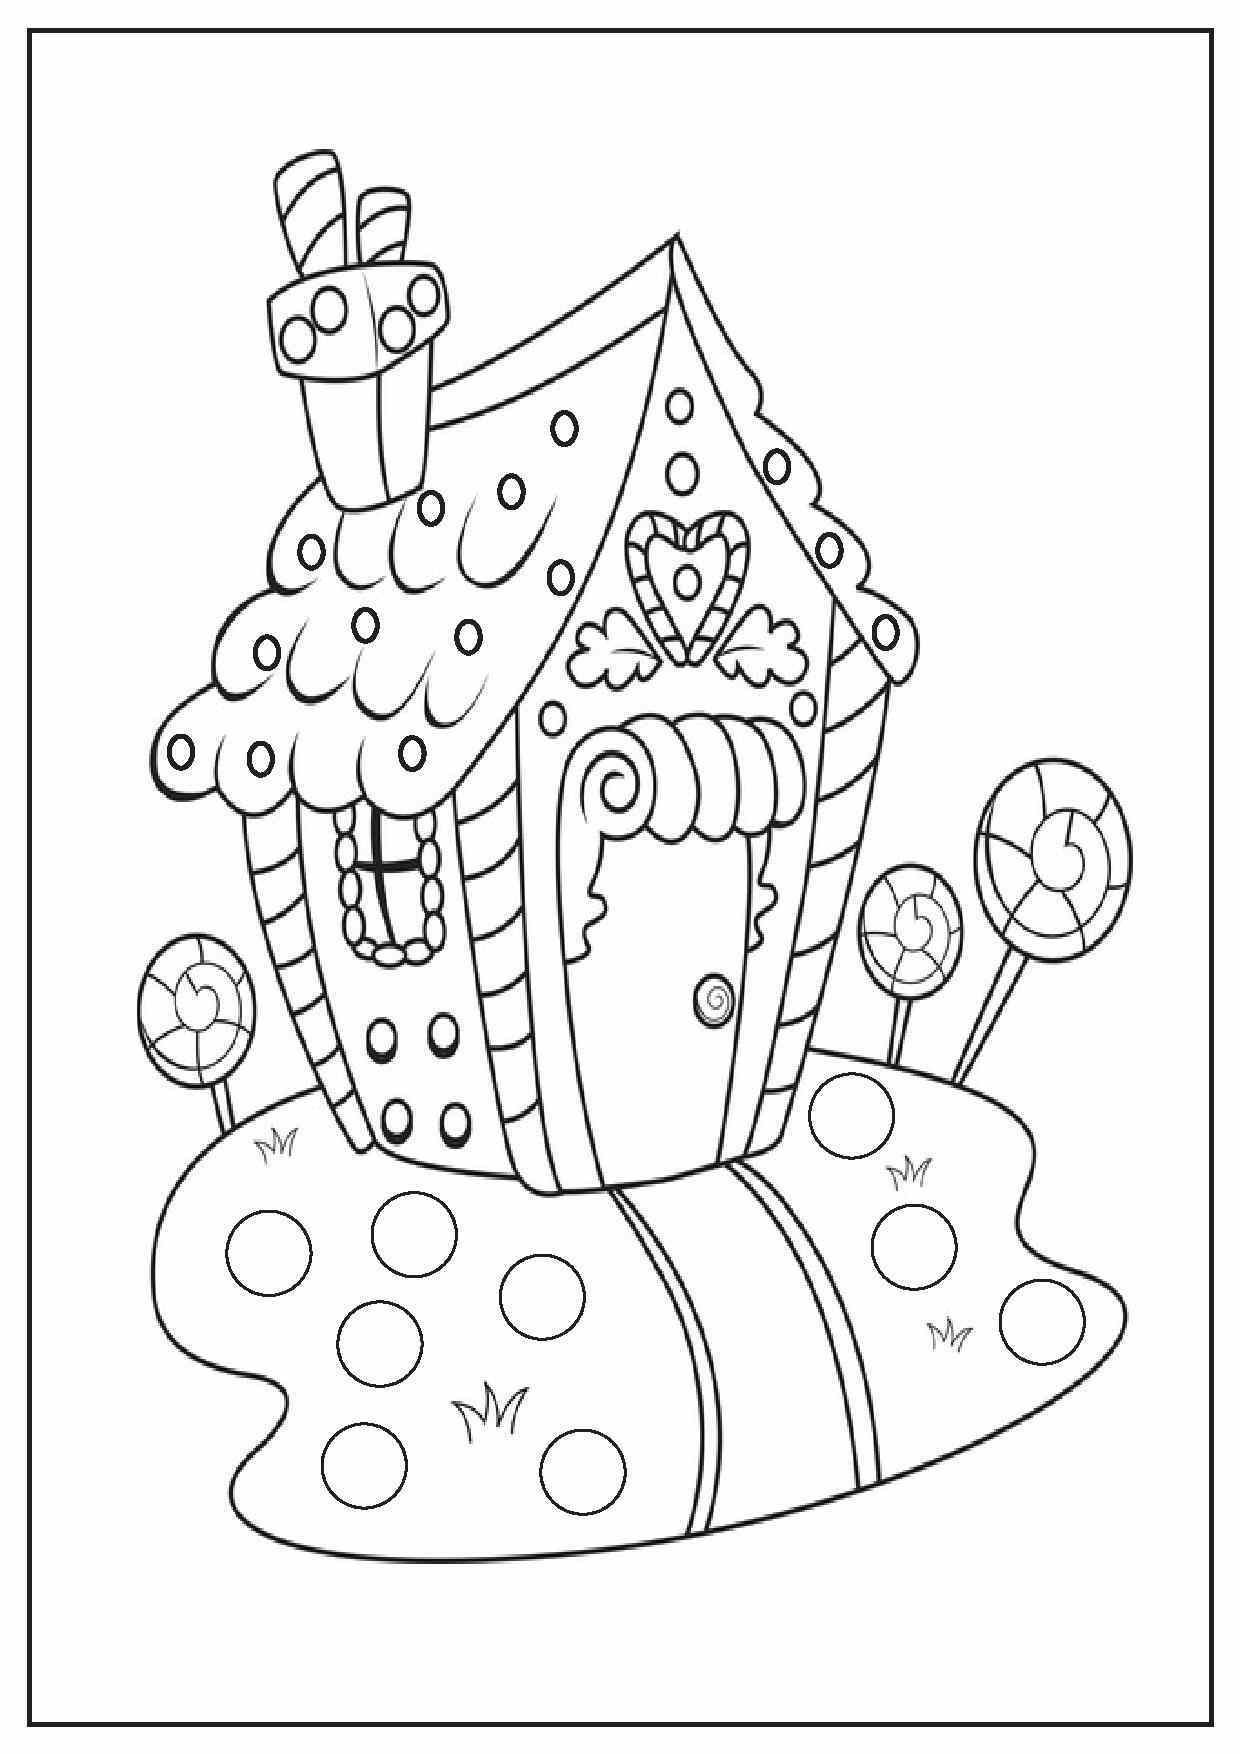 Printable Drawing Sheets At Getdrawings Free For Personal Christmas Coloring Sheets Printable Christmas Coloring Pages Christmas Coloring Books